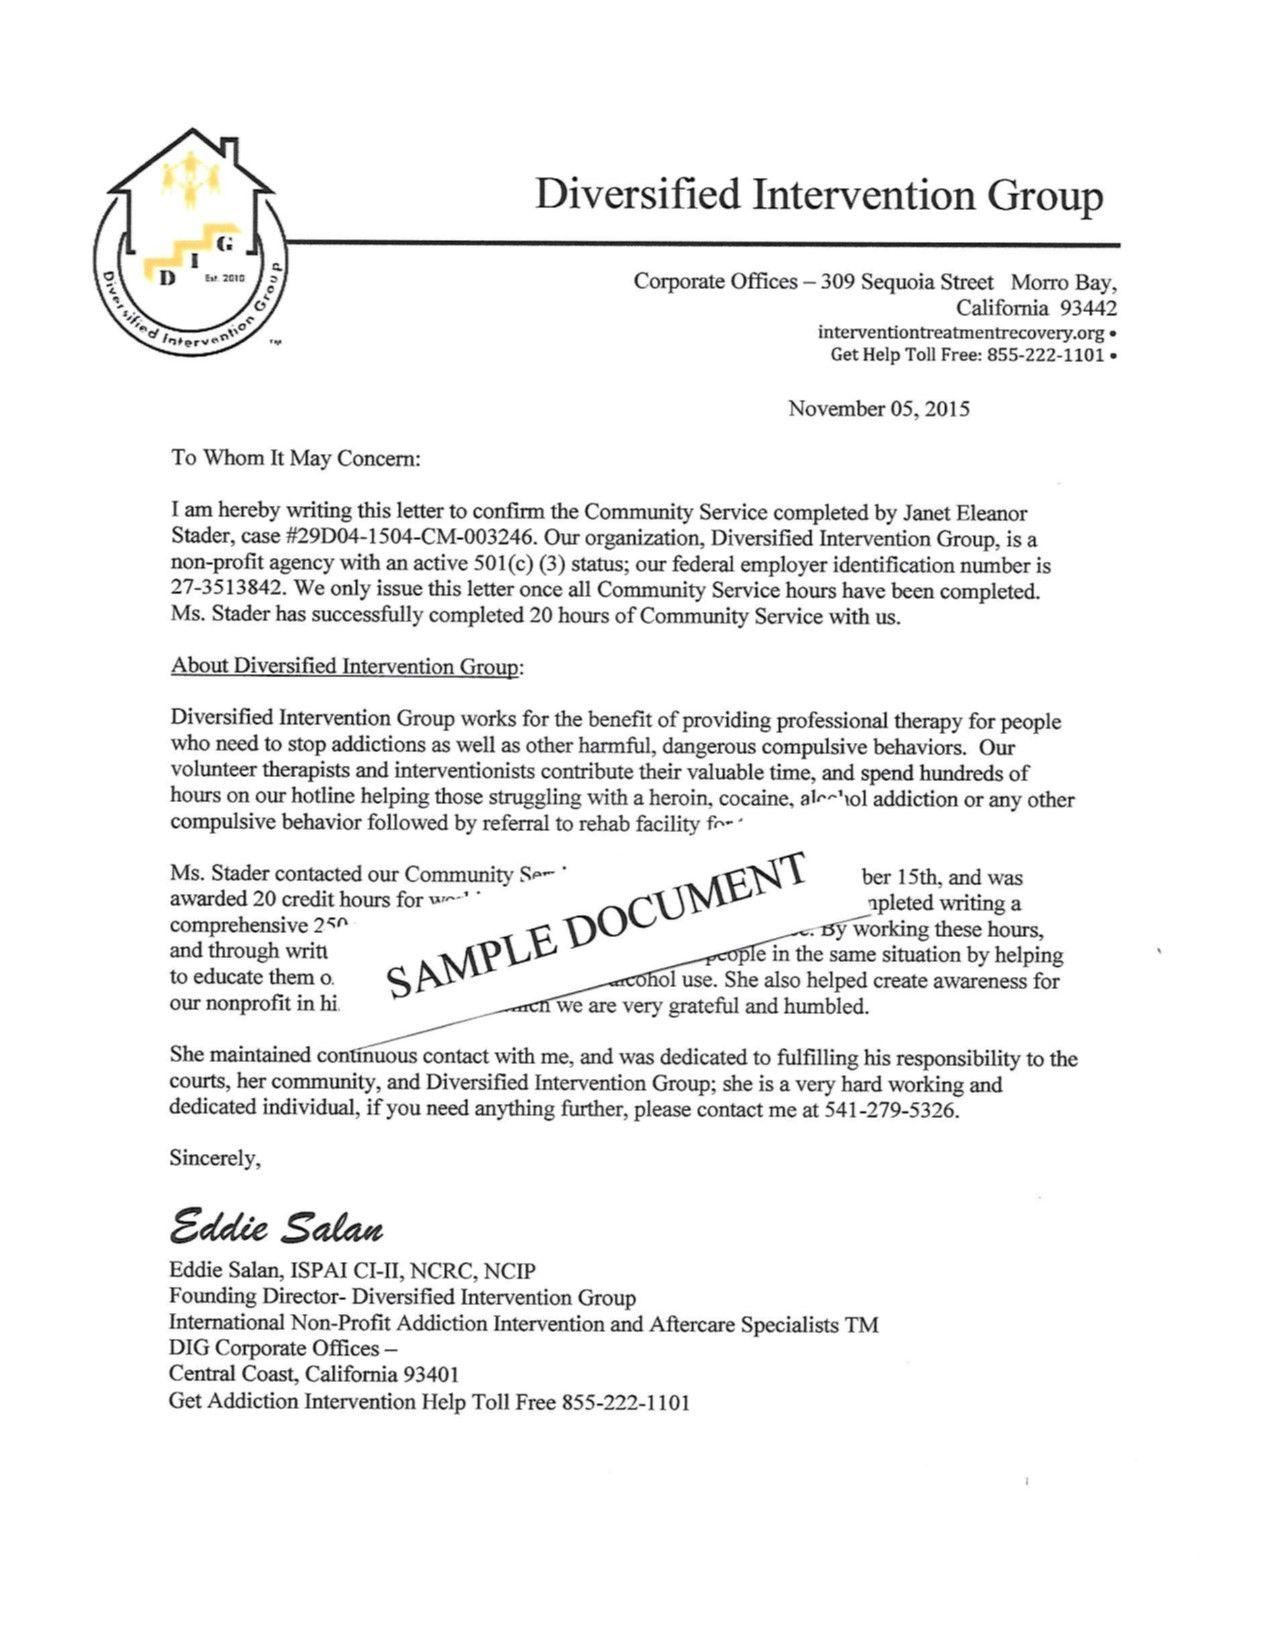 Sample Of Community Service Letter Beautiful Munity Service